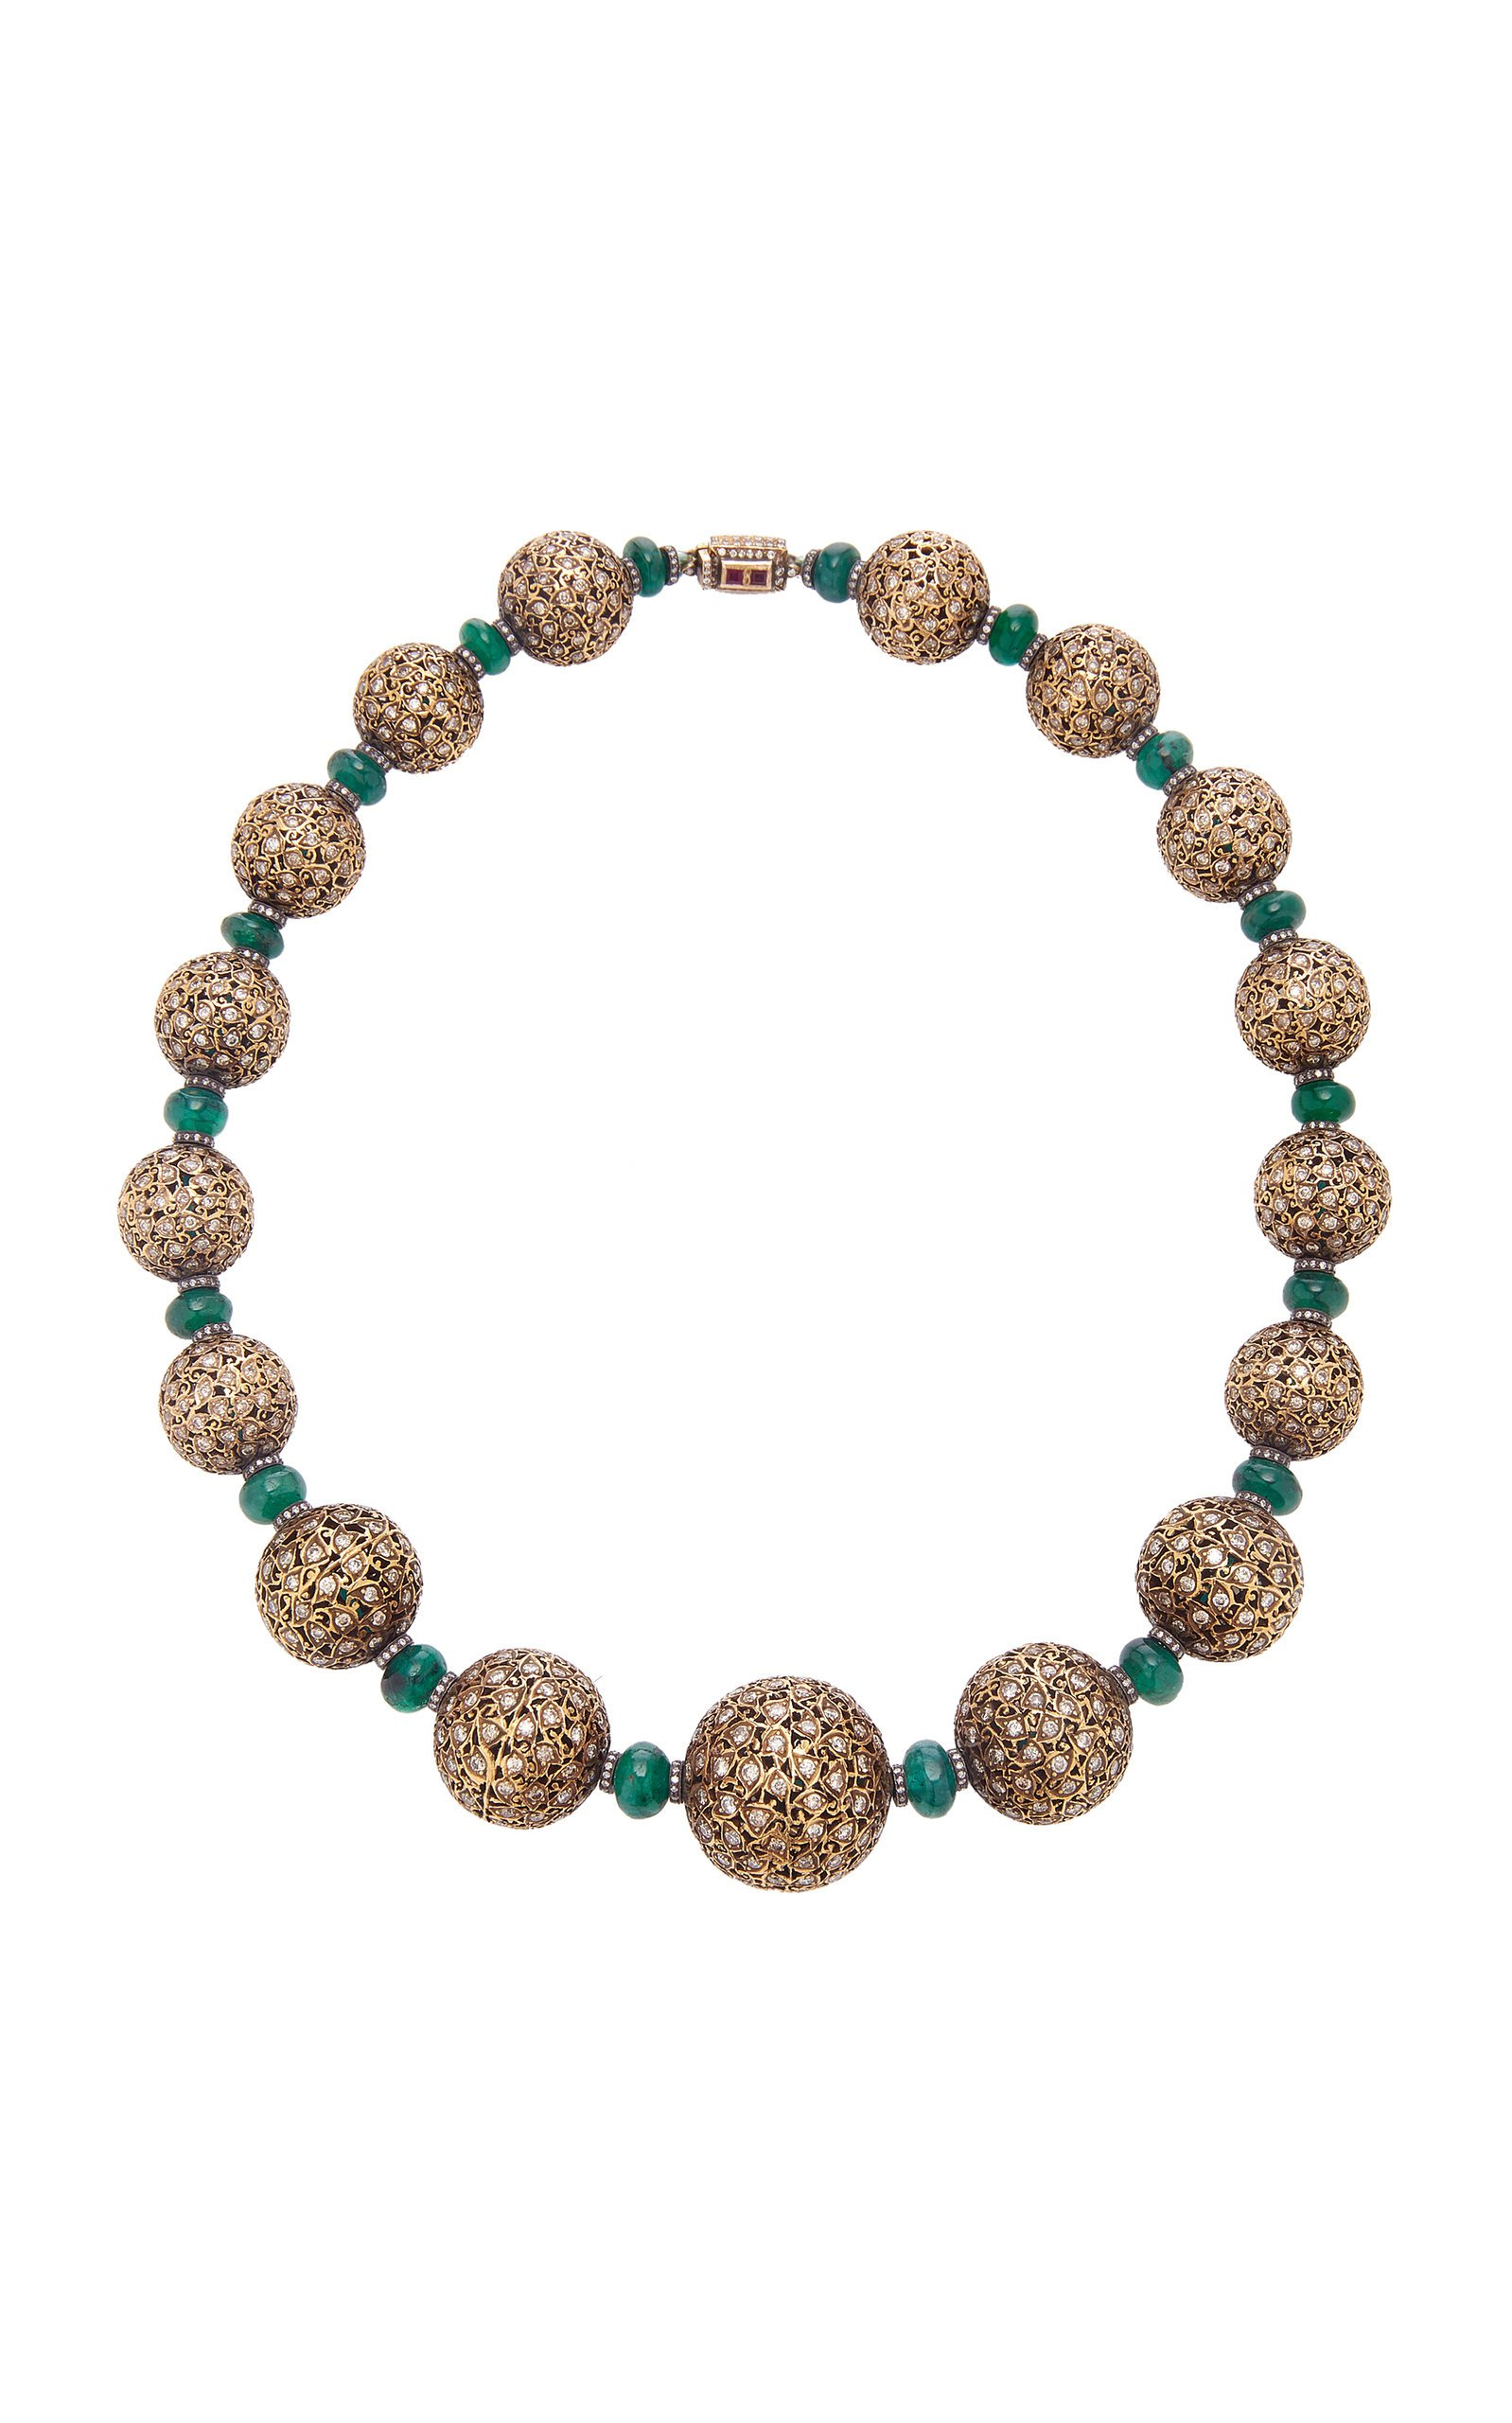 18K Gold, Emerald And Diamond Necklace by Sanjay Kasliwal | Moda Operandi